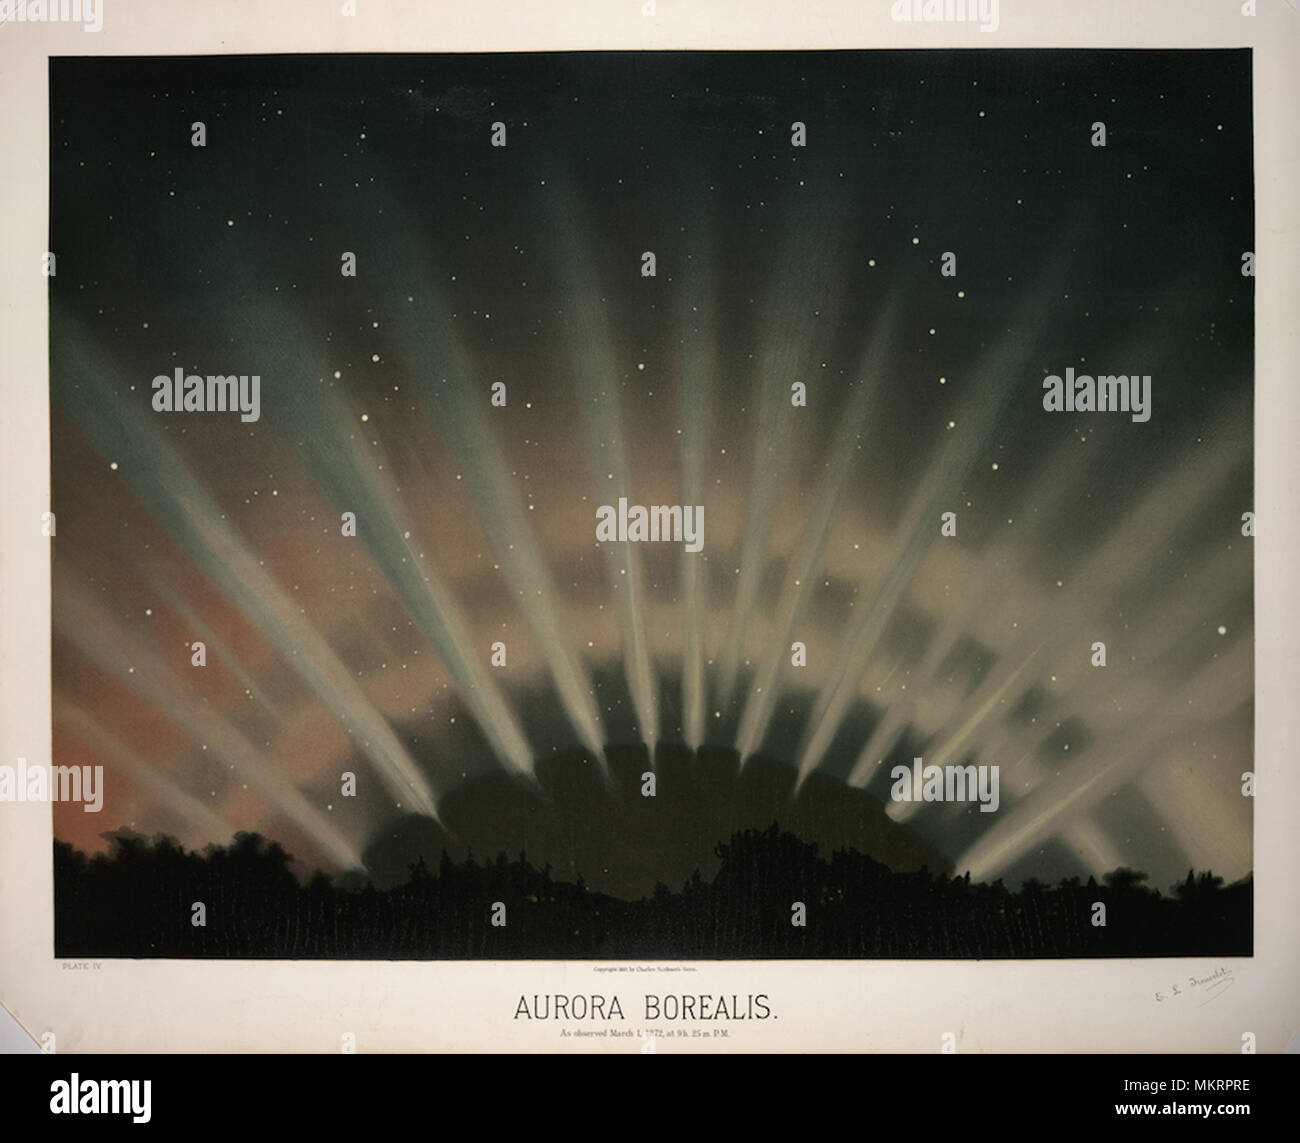 An astrological illustration - Stock Image